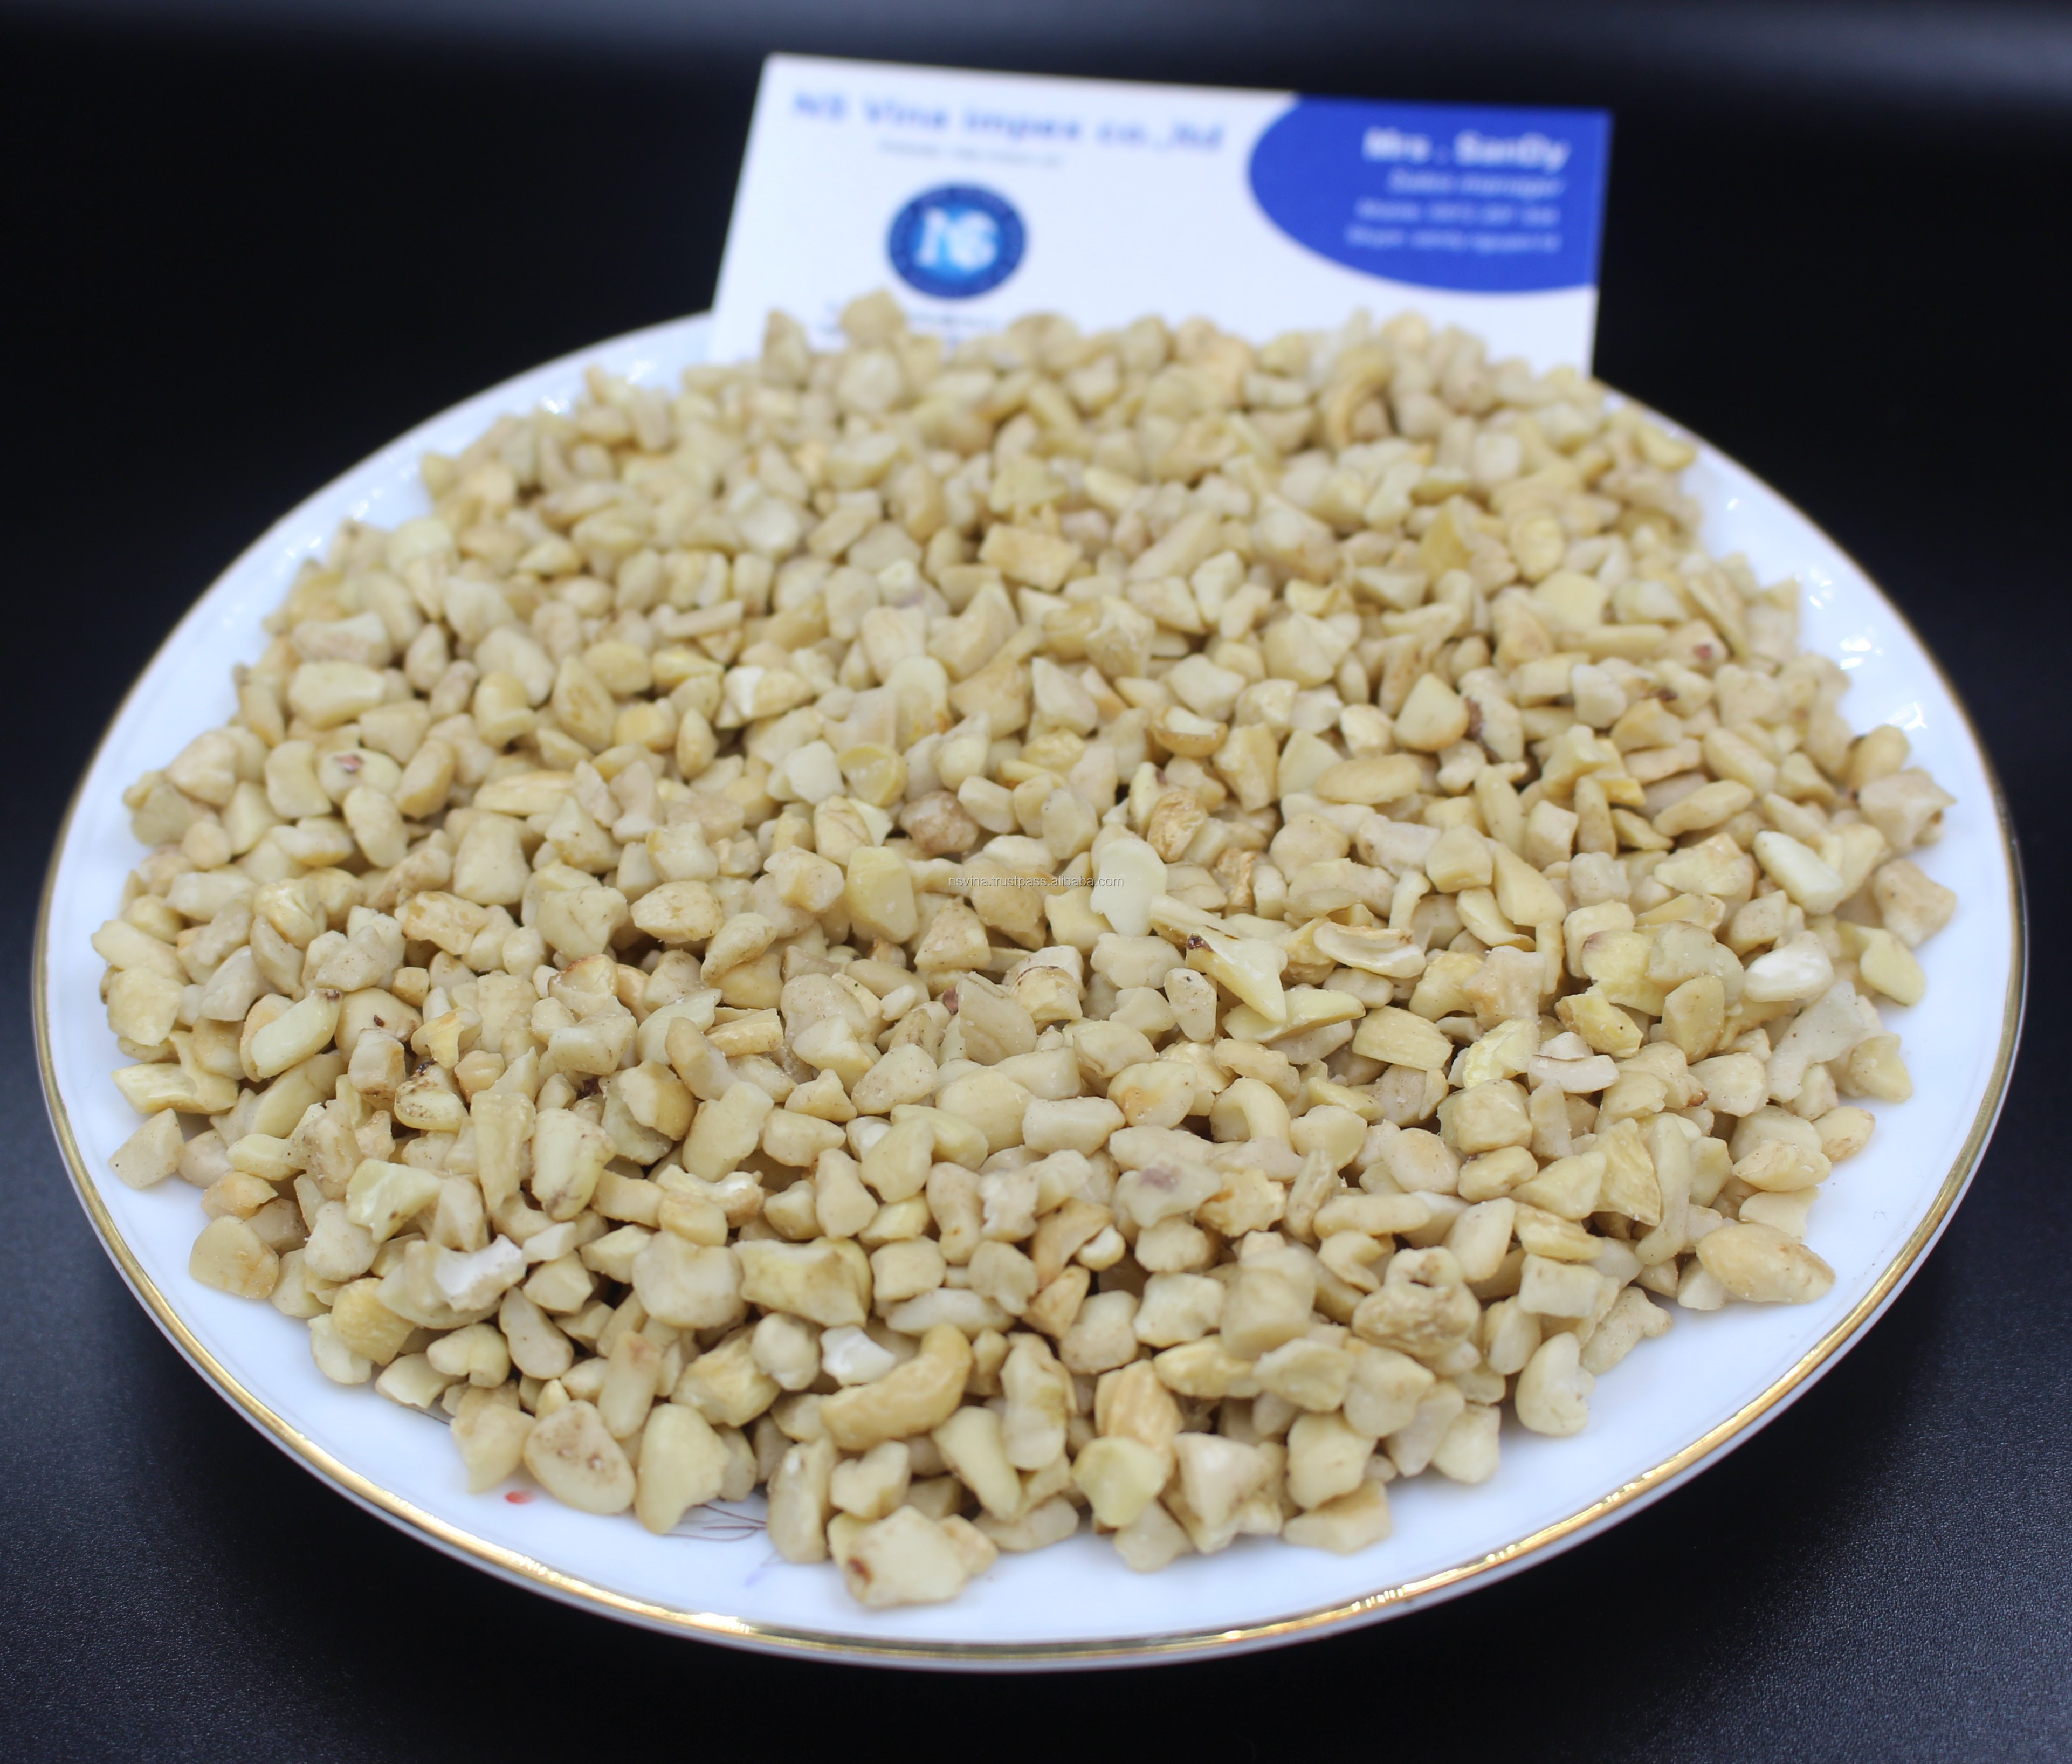 Vietnam Good Price W240 W320 W450 Ws Lp Lsp Ssp Bb Cashew Nut